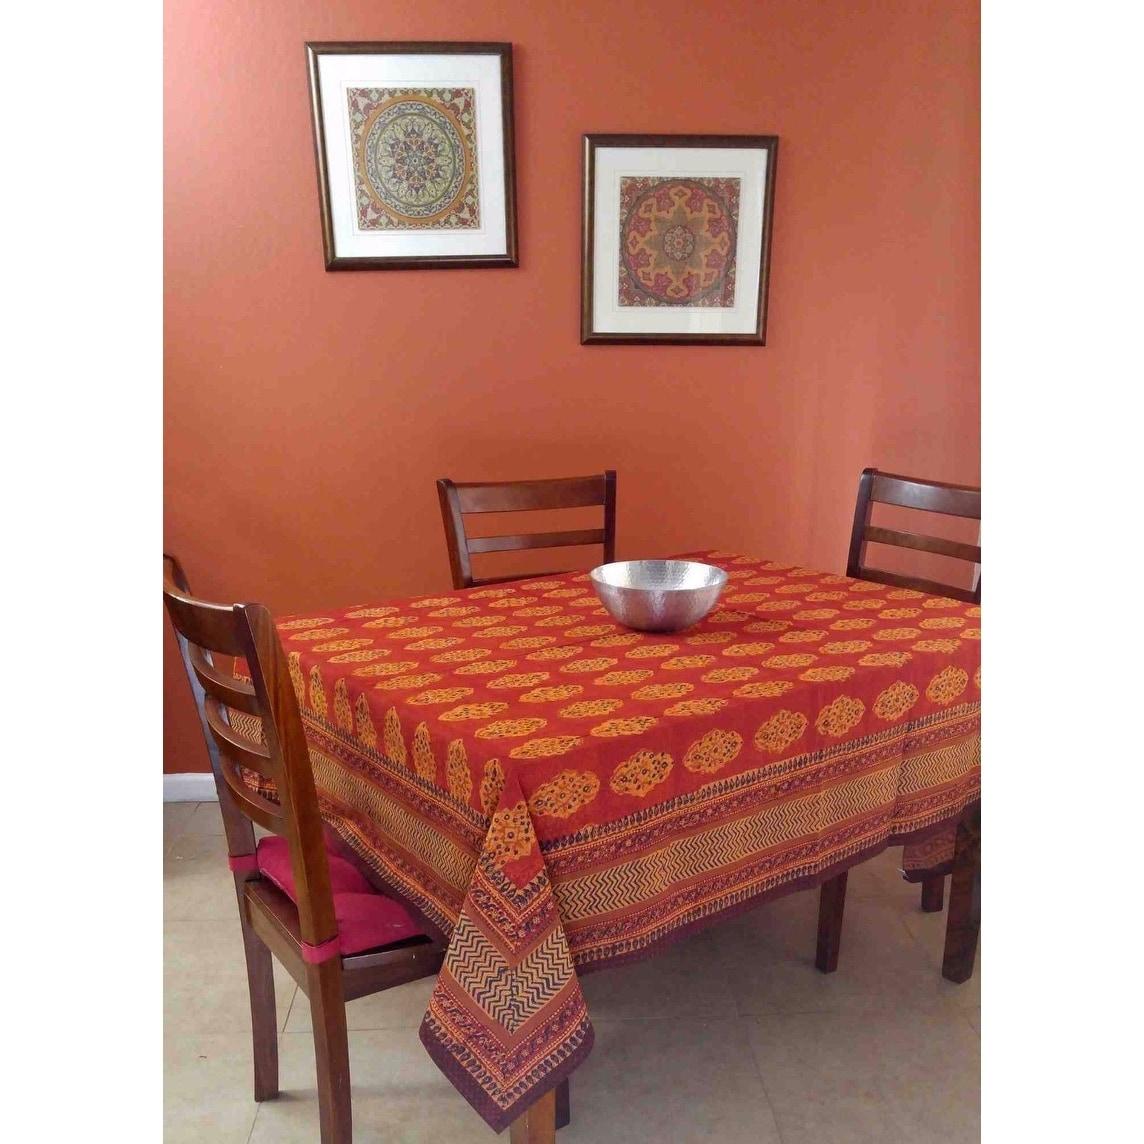 Handmade Kensington Block Print Tablecloth 100% Cotton Rust Brown Rectangular Square Round - Thumbnail 2